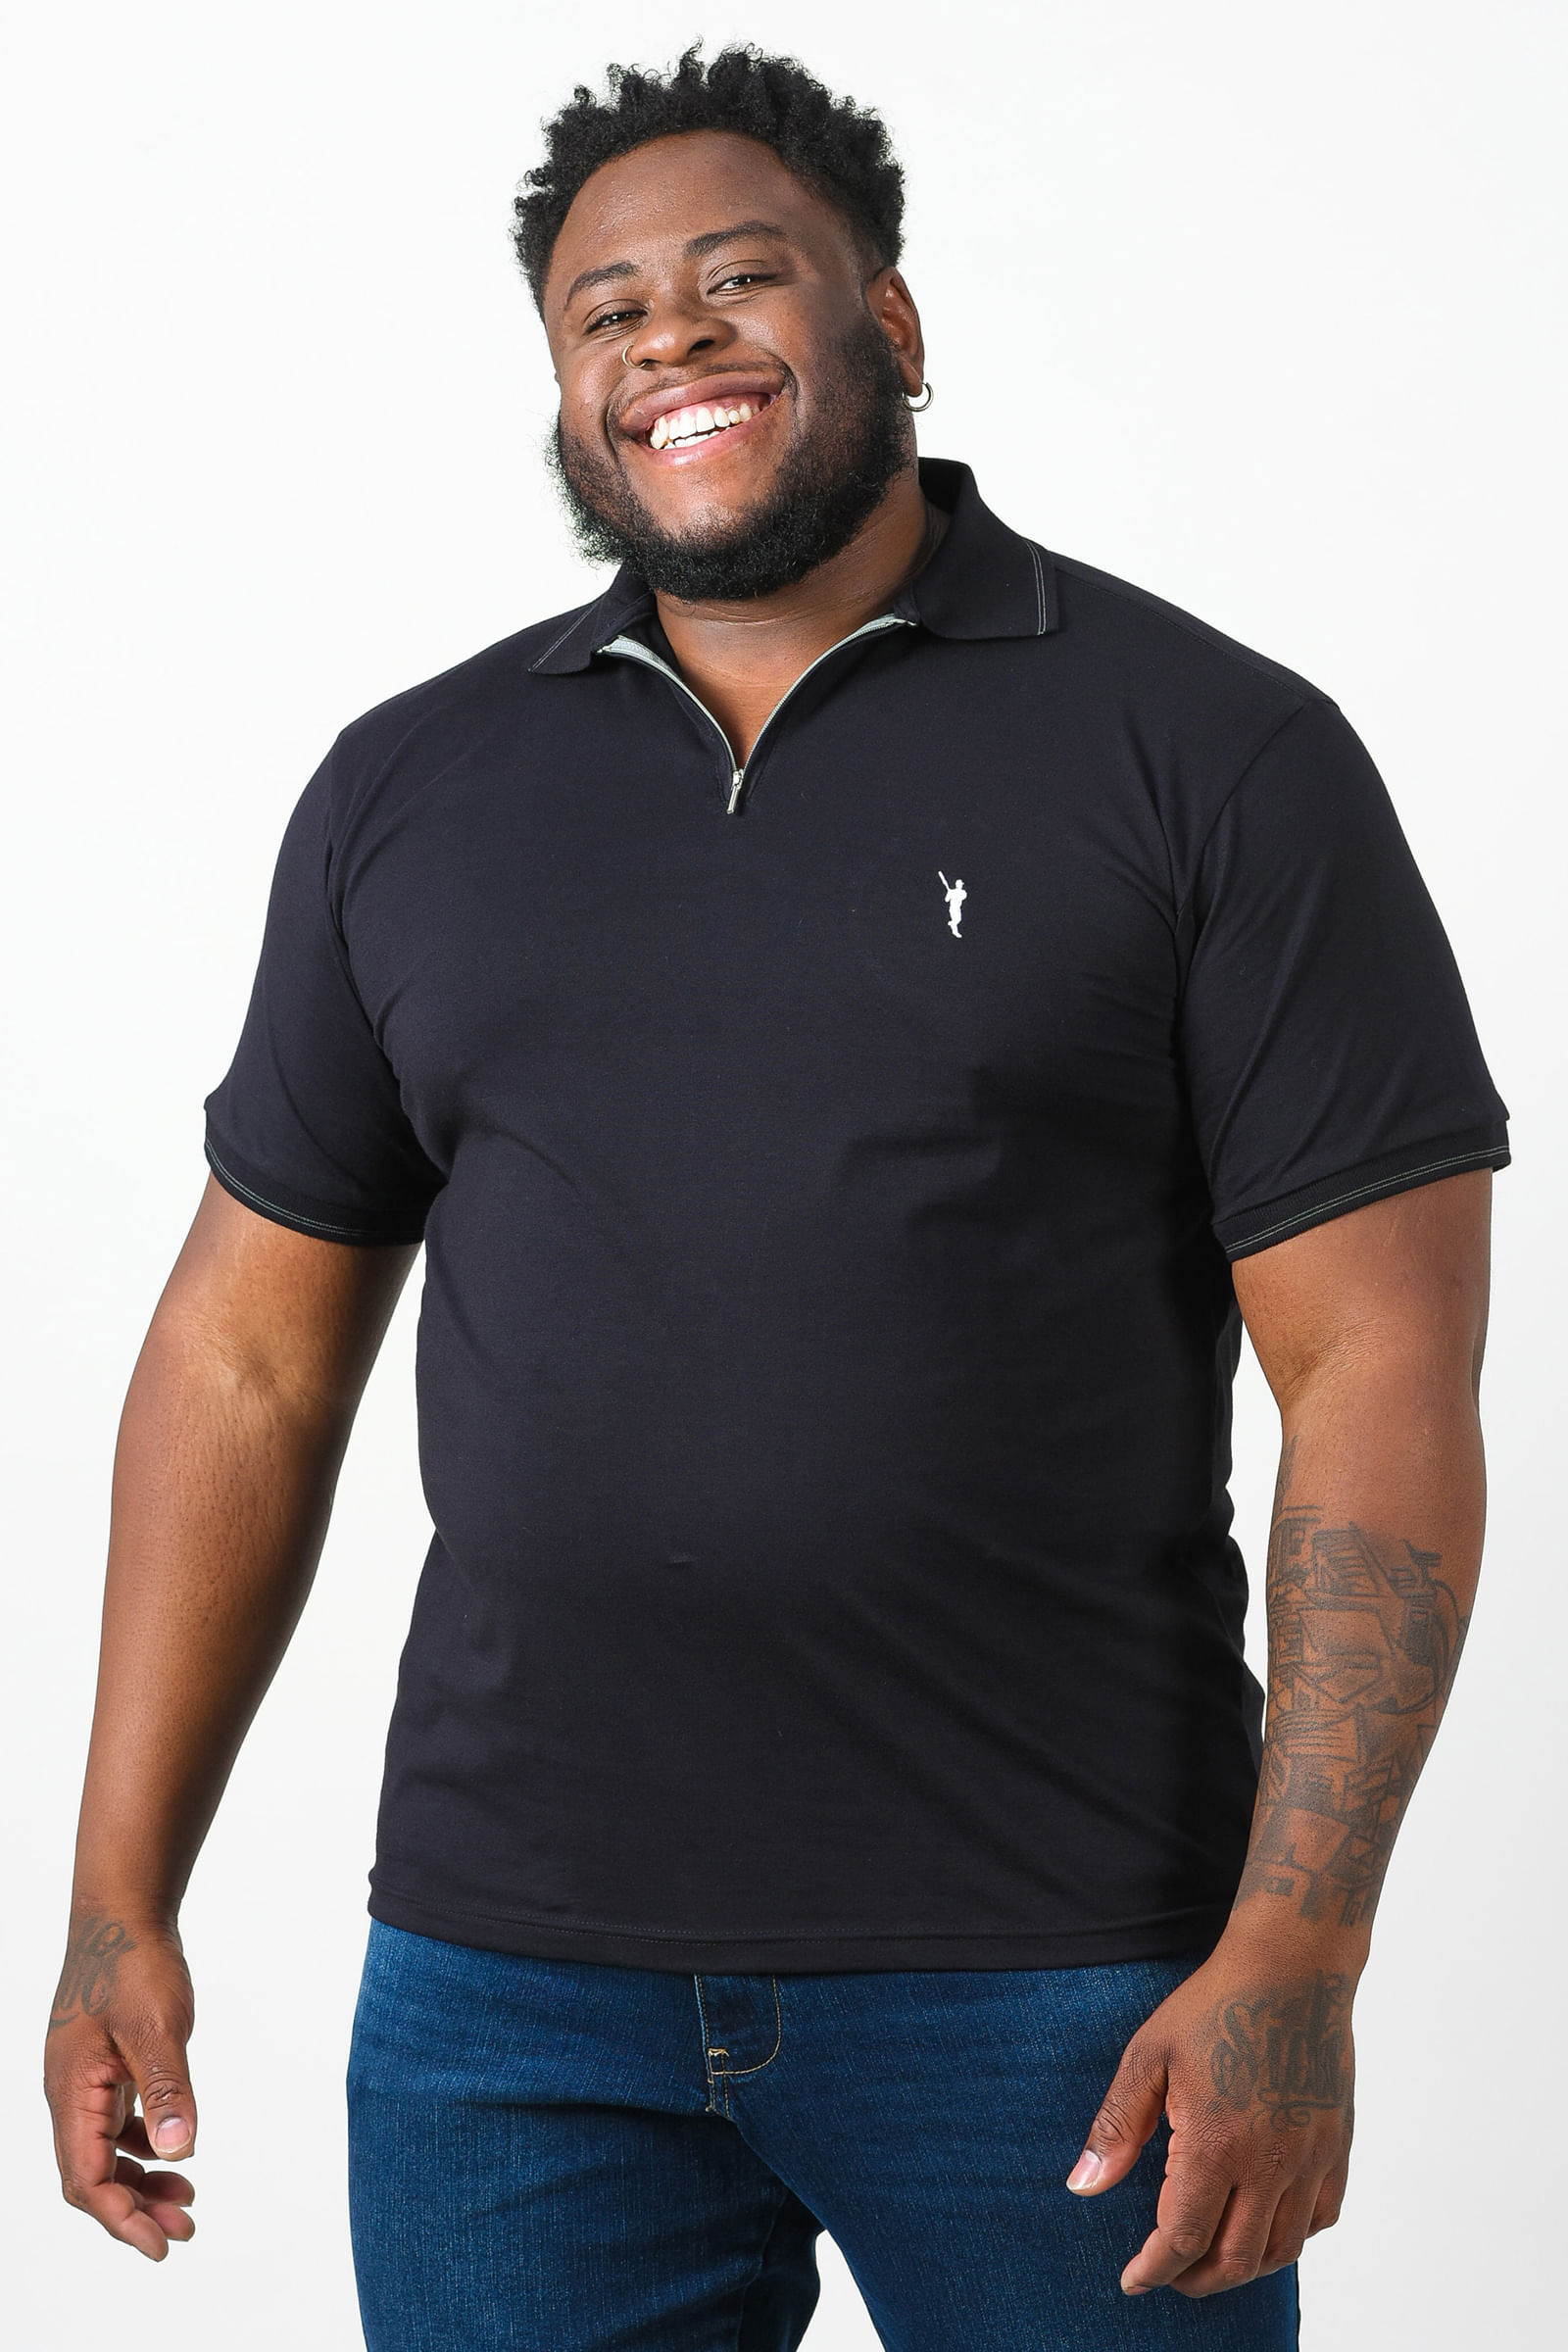 Camisa polo com zíper plus size preto